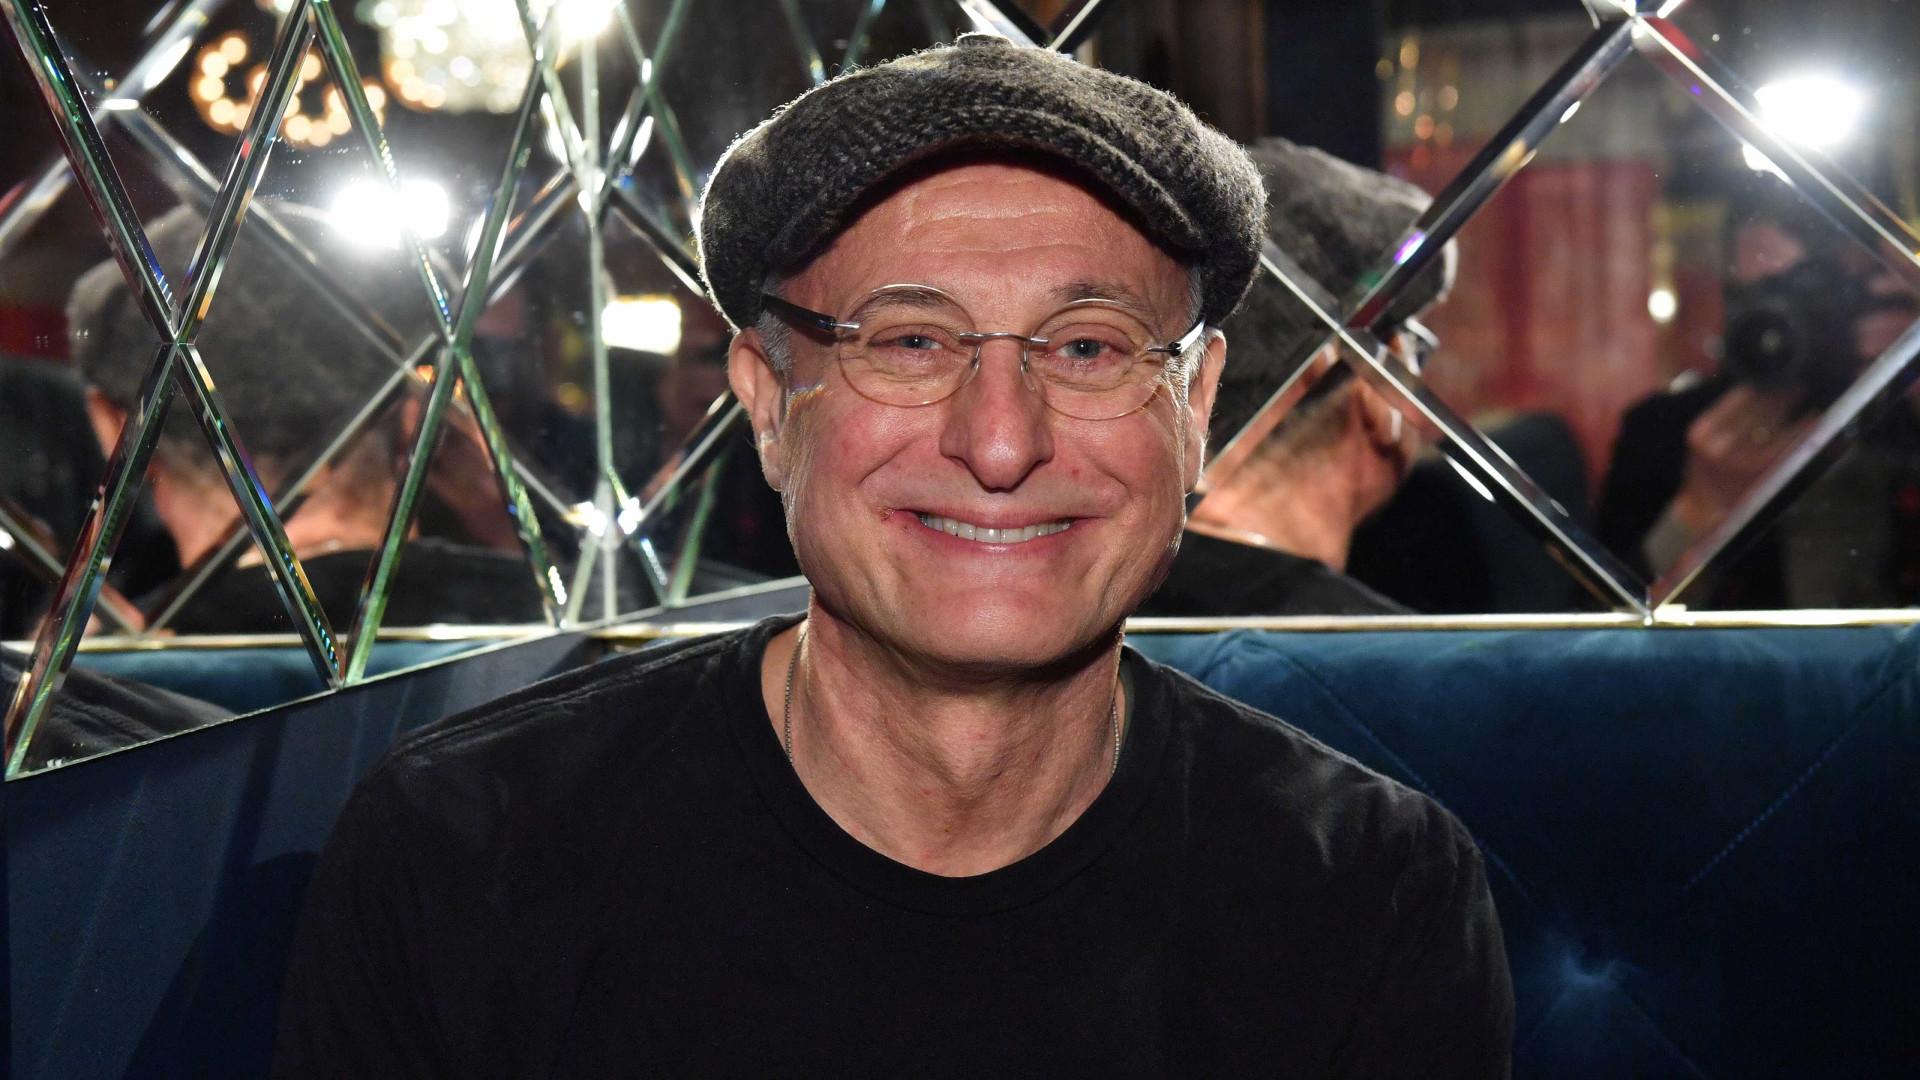 Morre Michael Nyqvist, estrela sueca da trilogia Millennium